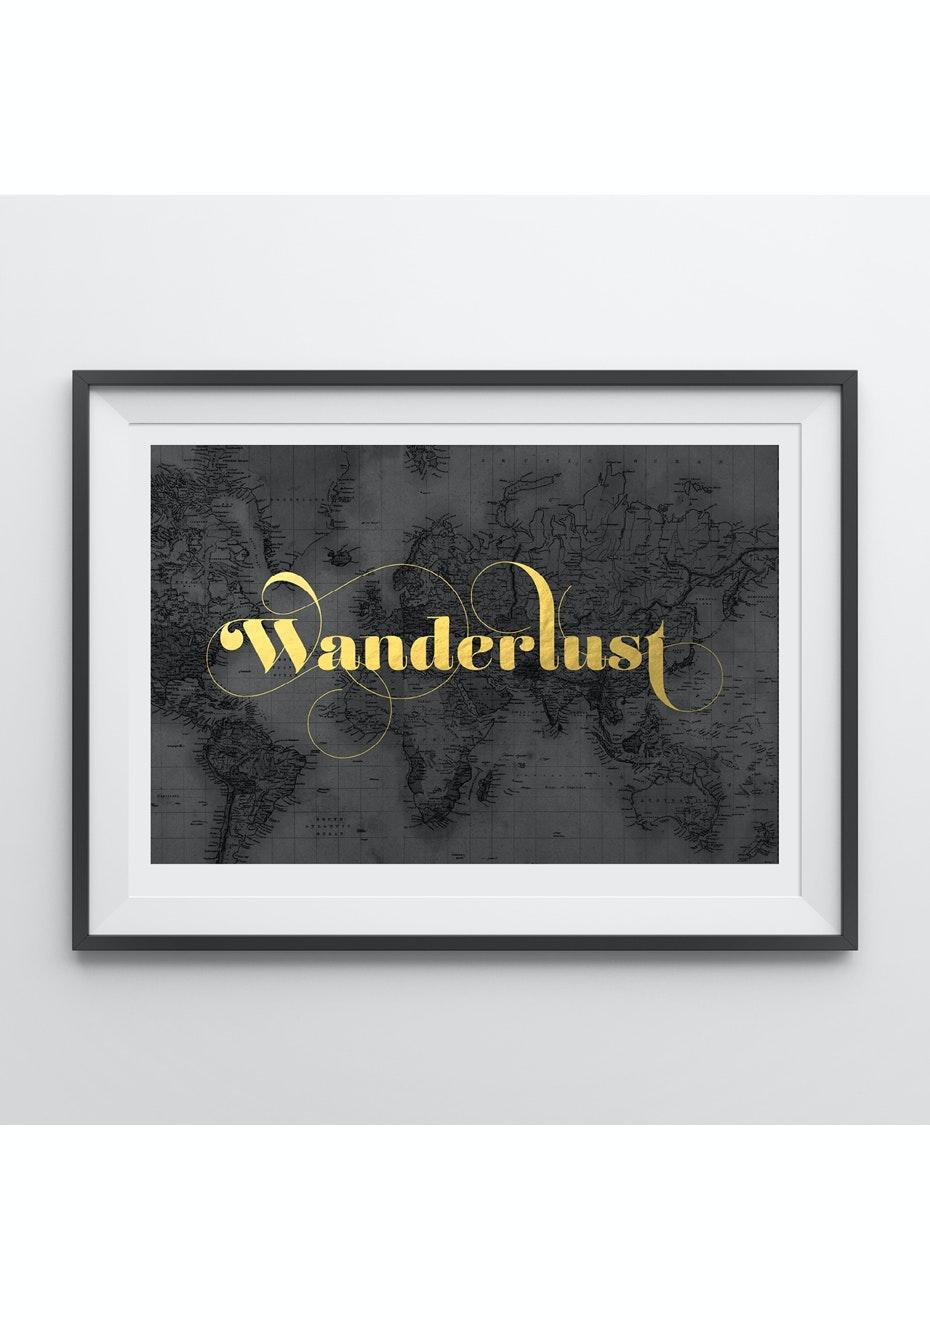 Simply Creative - Wanderlust - A4 Gold Foil Print